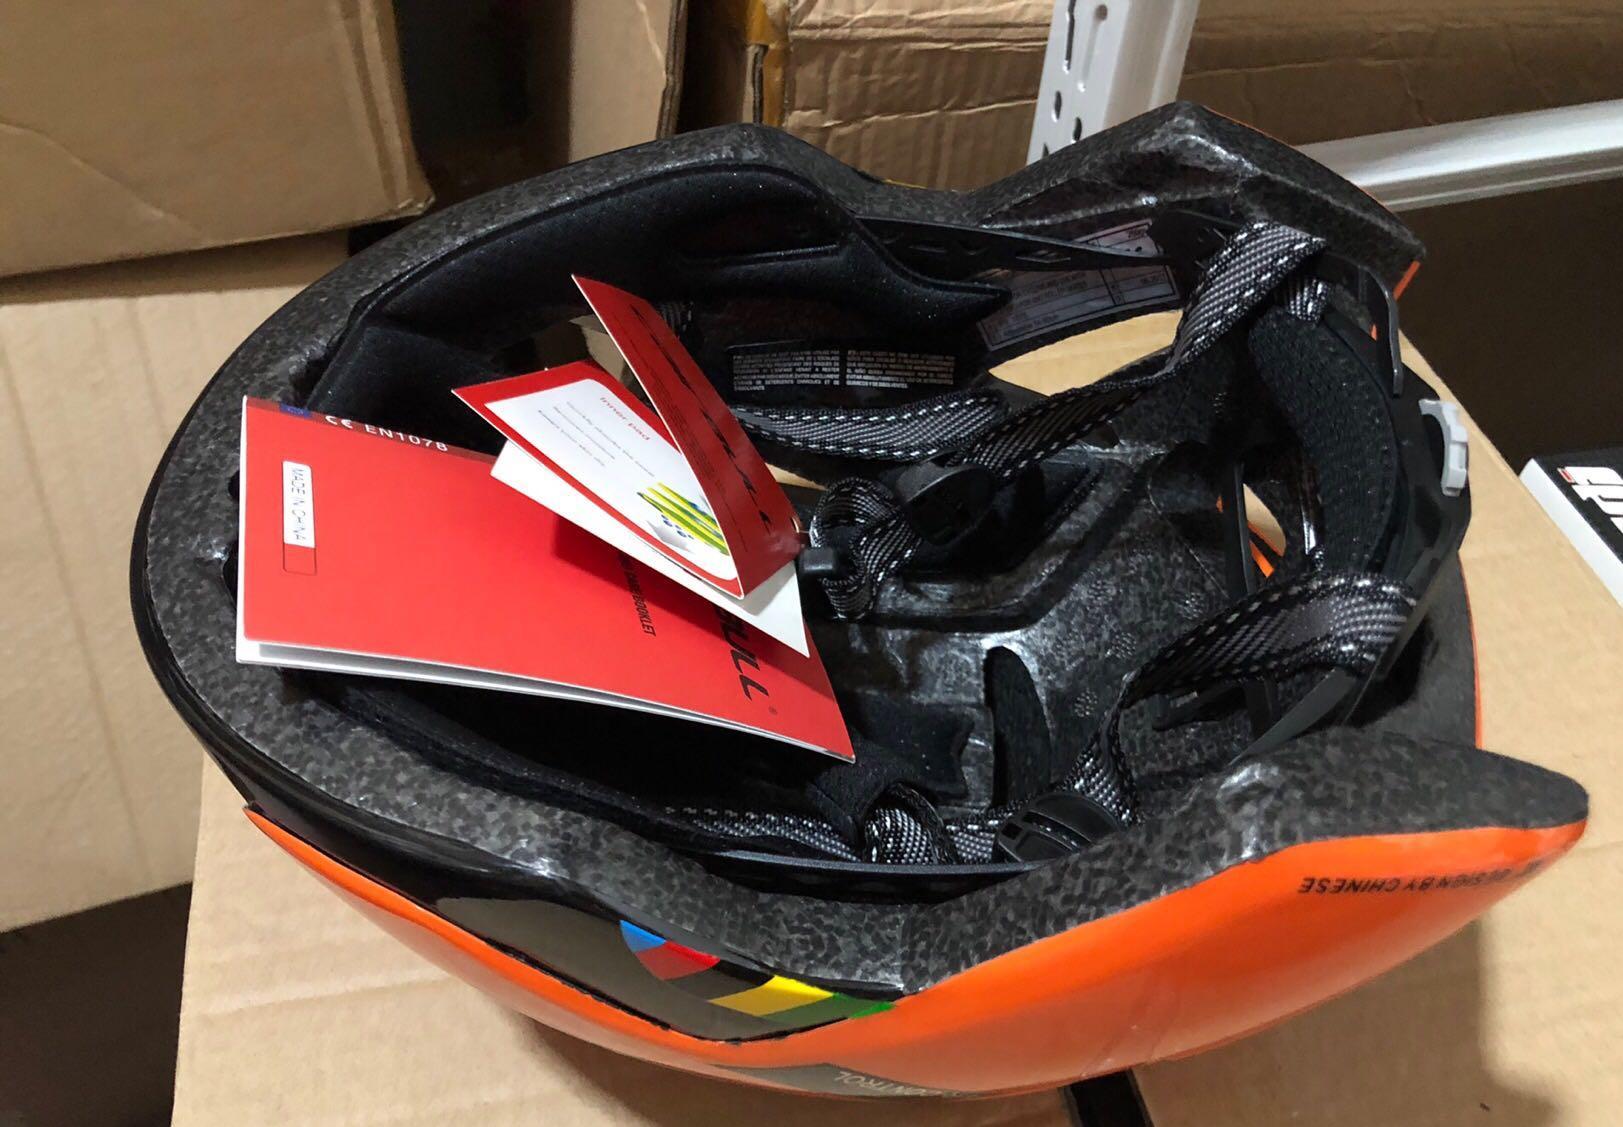 Road bike 🚴♀️ pneumatic helmet/ 53-61cm / All new brand